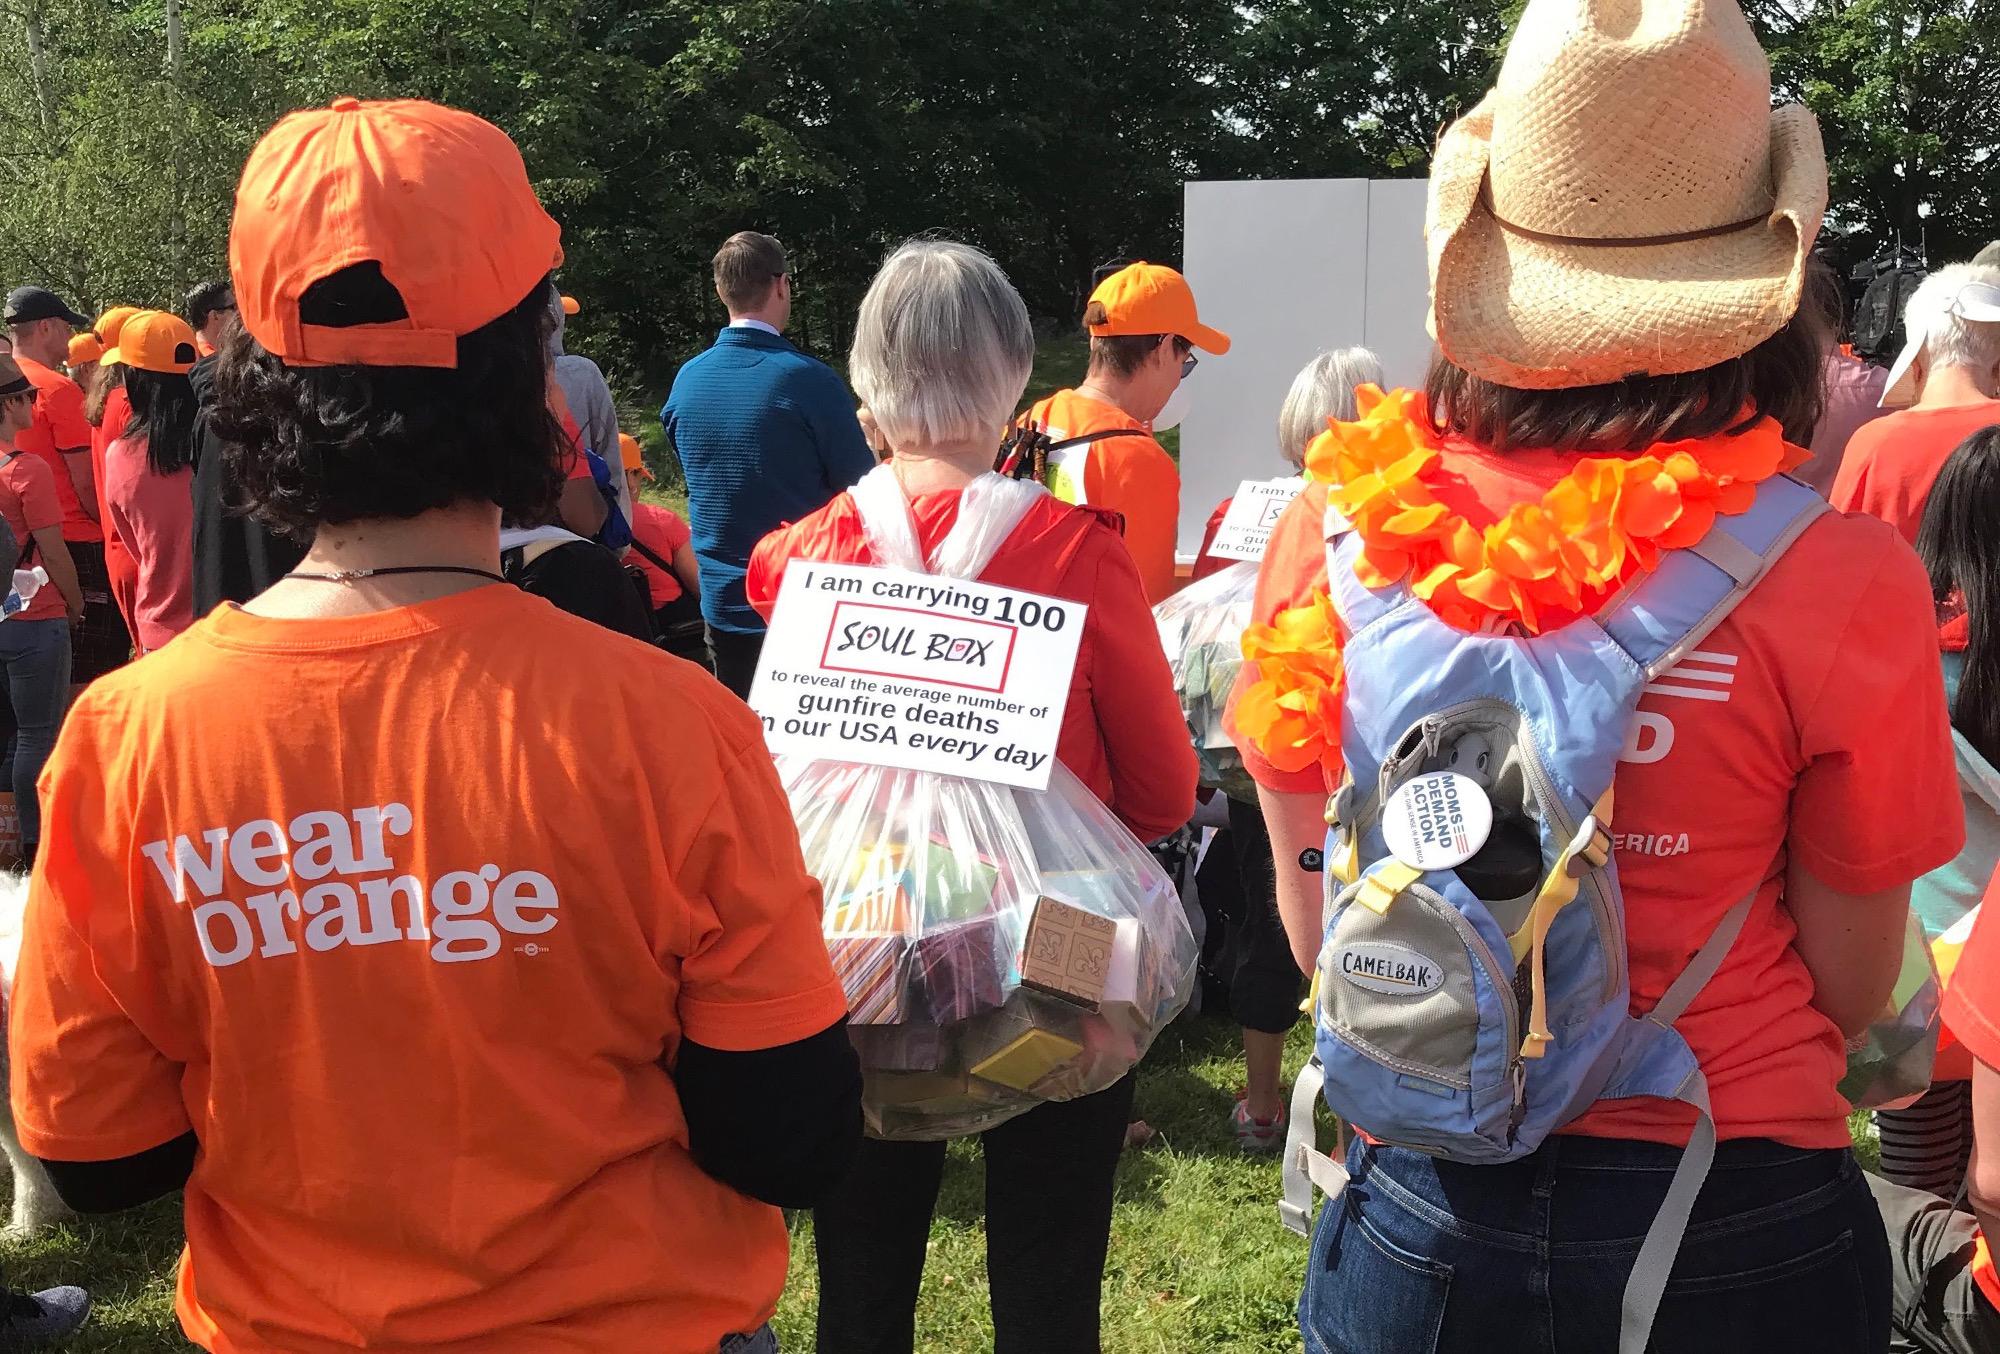 Soul Box backpack at a Wear Orange event